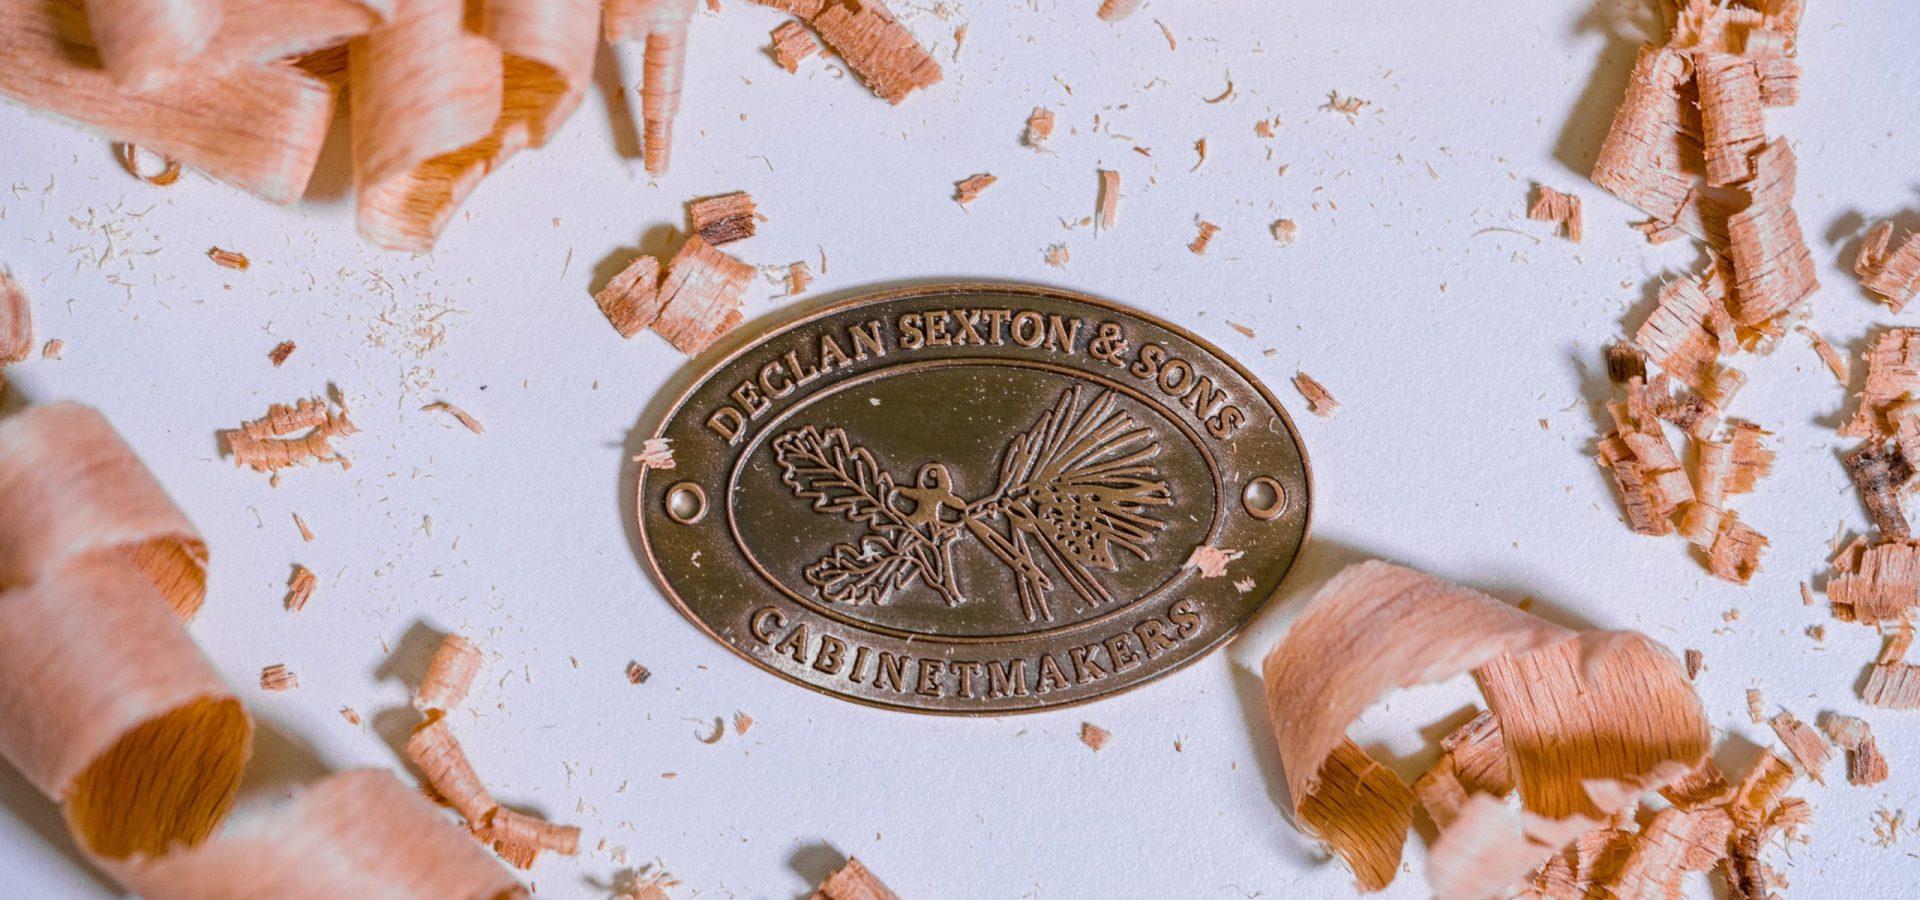 DECLAN SEXTON & SONS - MEET THE TEAM